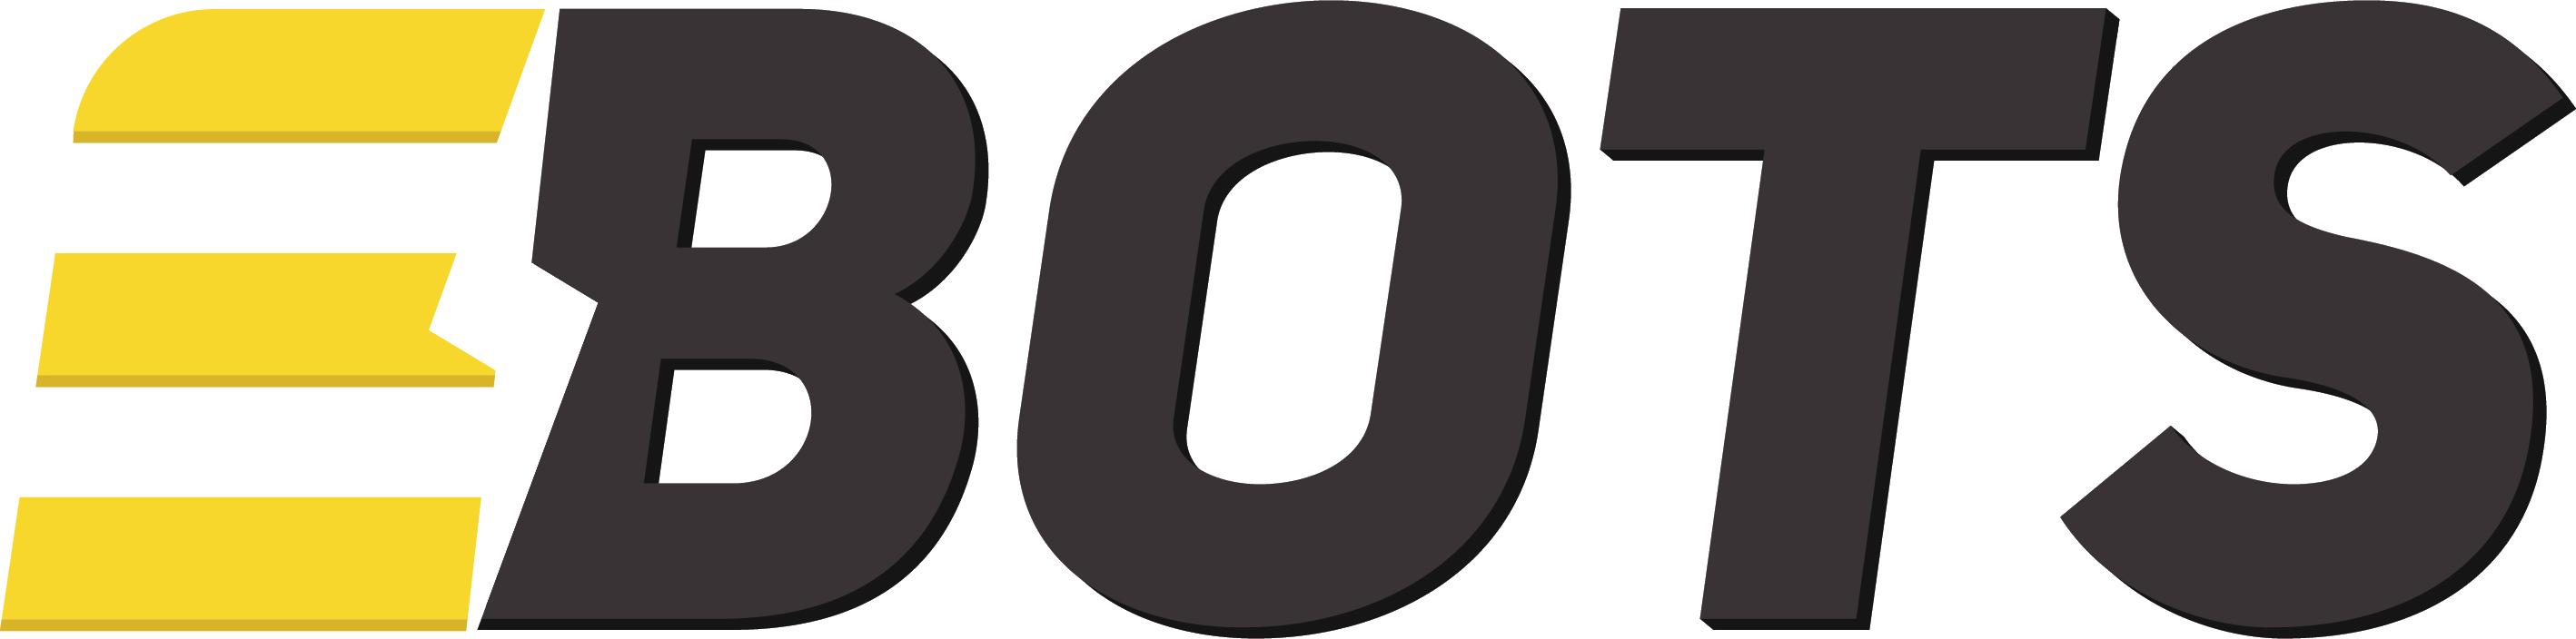 eBots-1